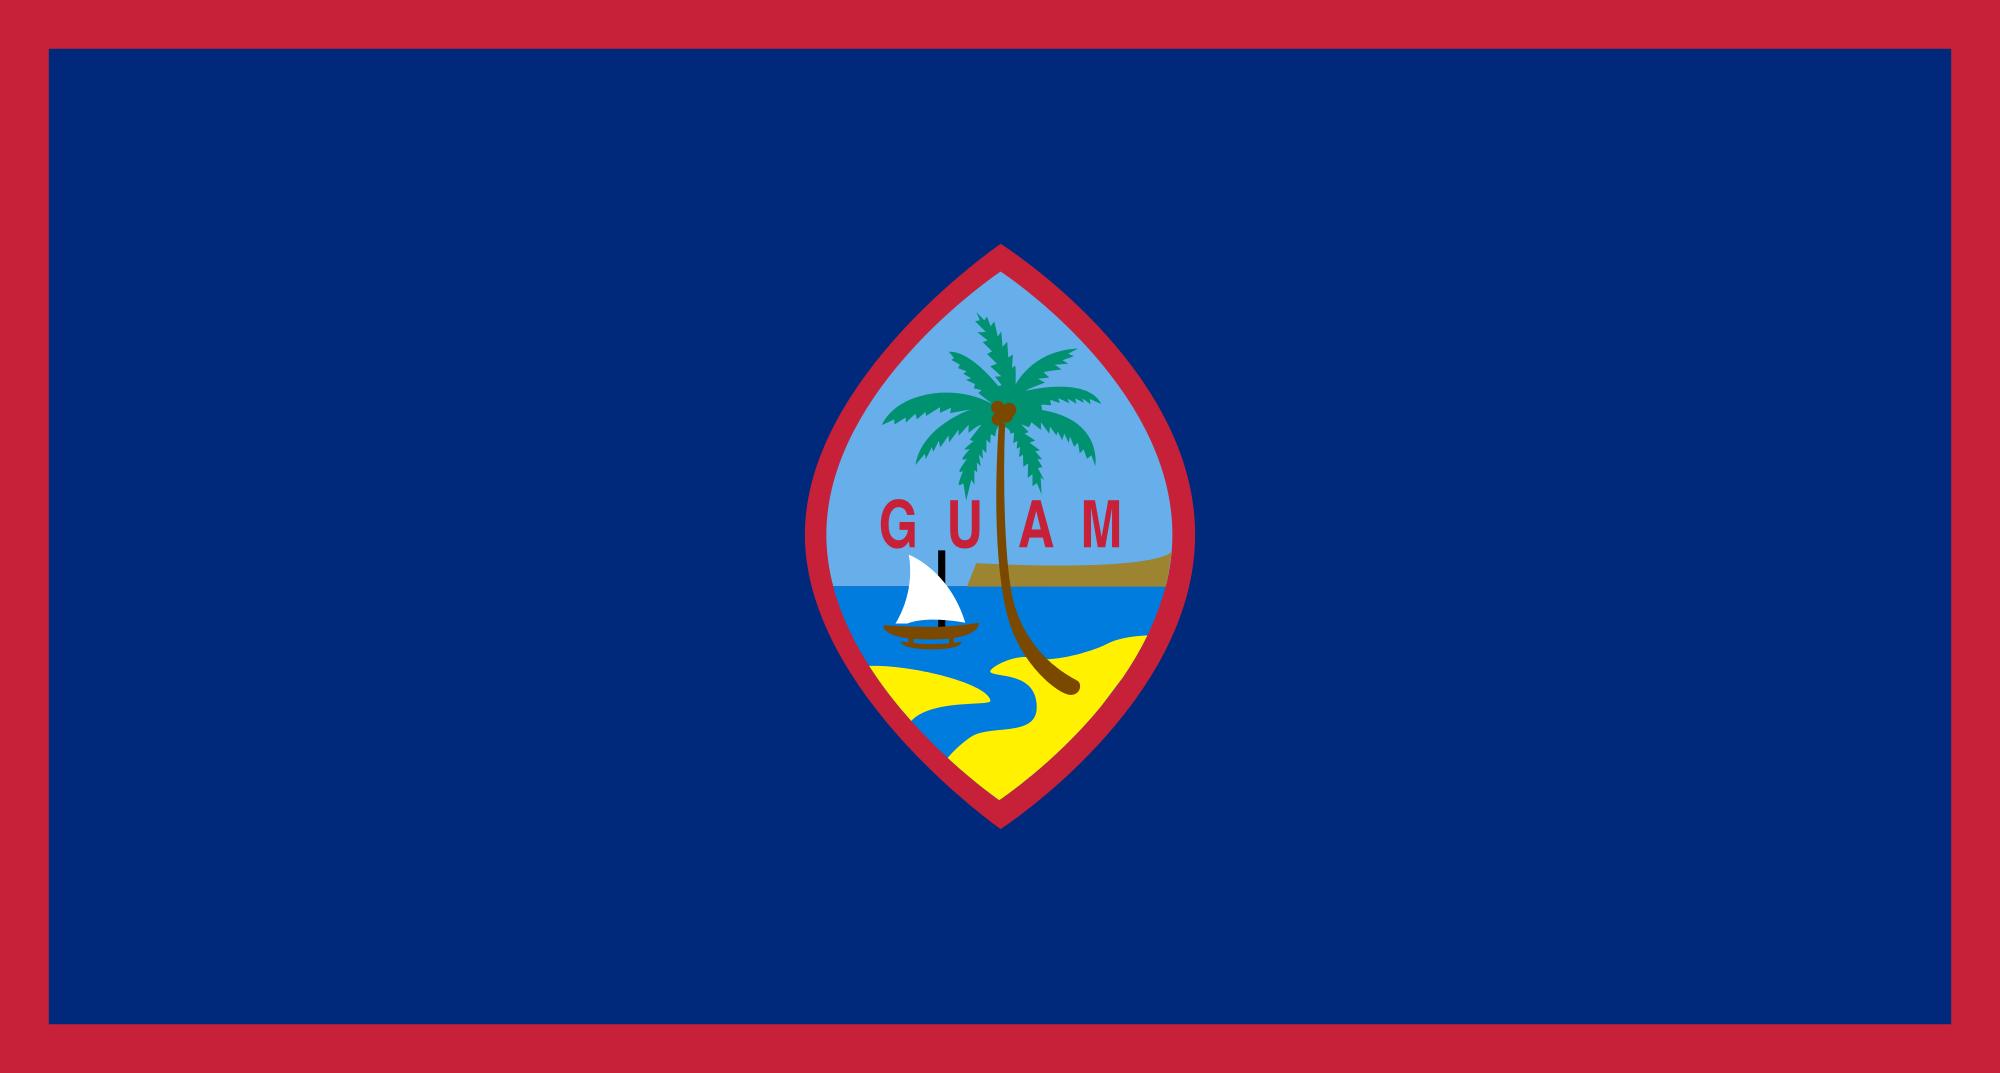 guam, страна, Эмблема, логотип, символ - Обои HD - Профессор falken.com